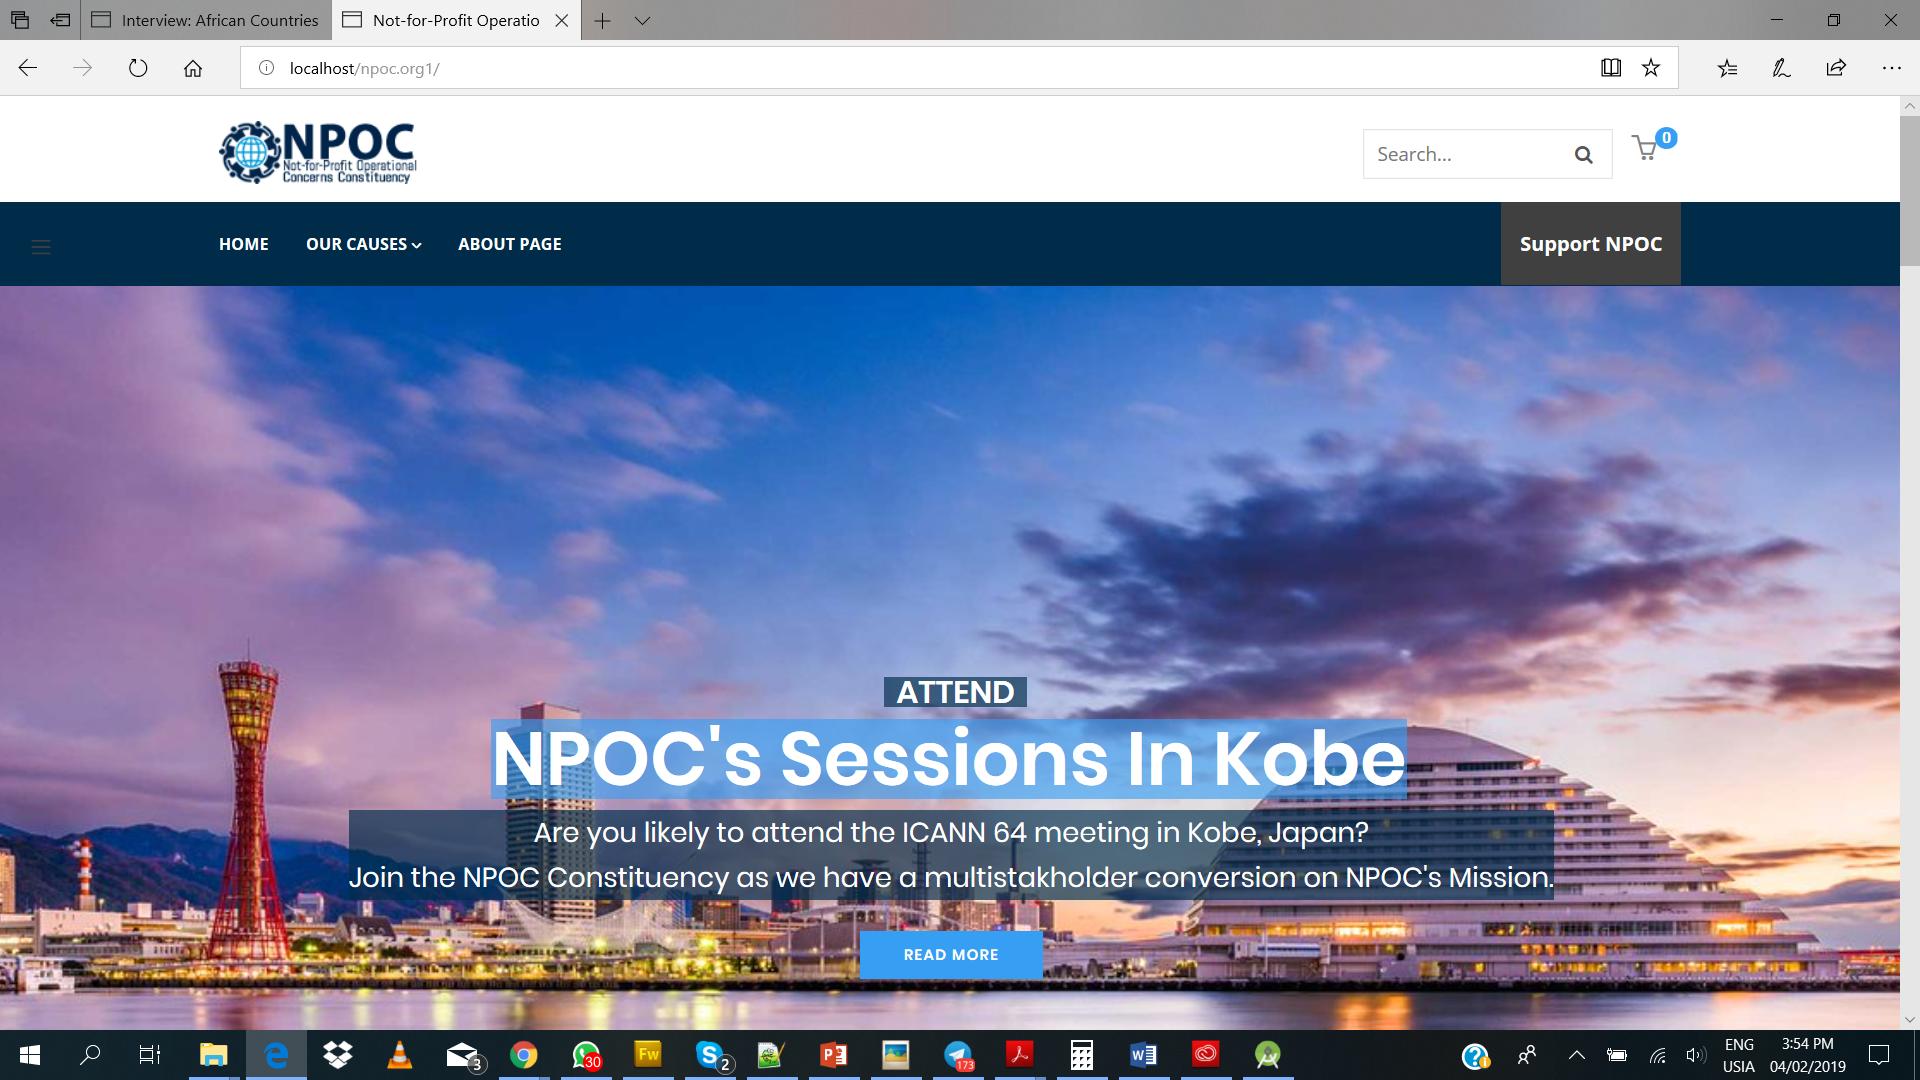 NPOC has a brand new website!